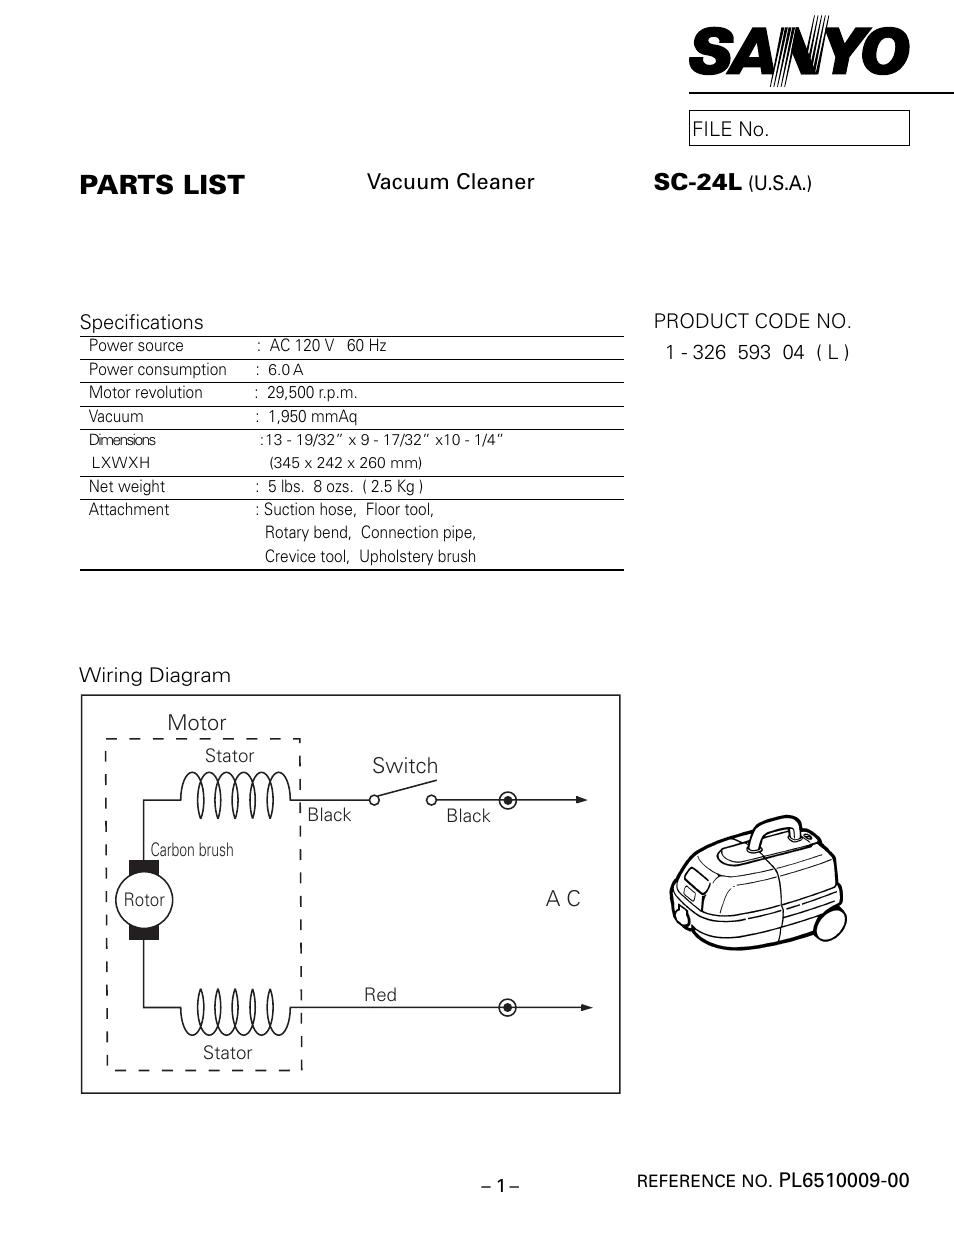 sanyo sc 24l user manual 4 pages rh manualsdir com